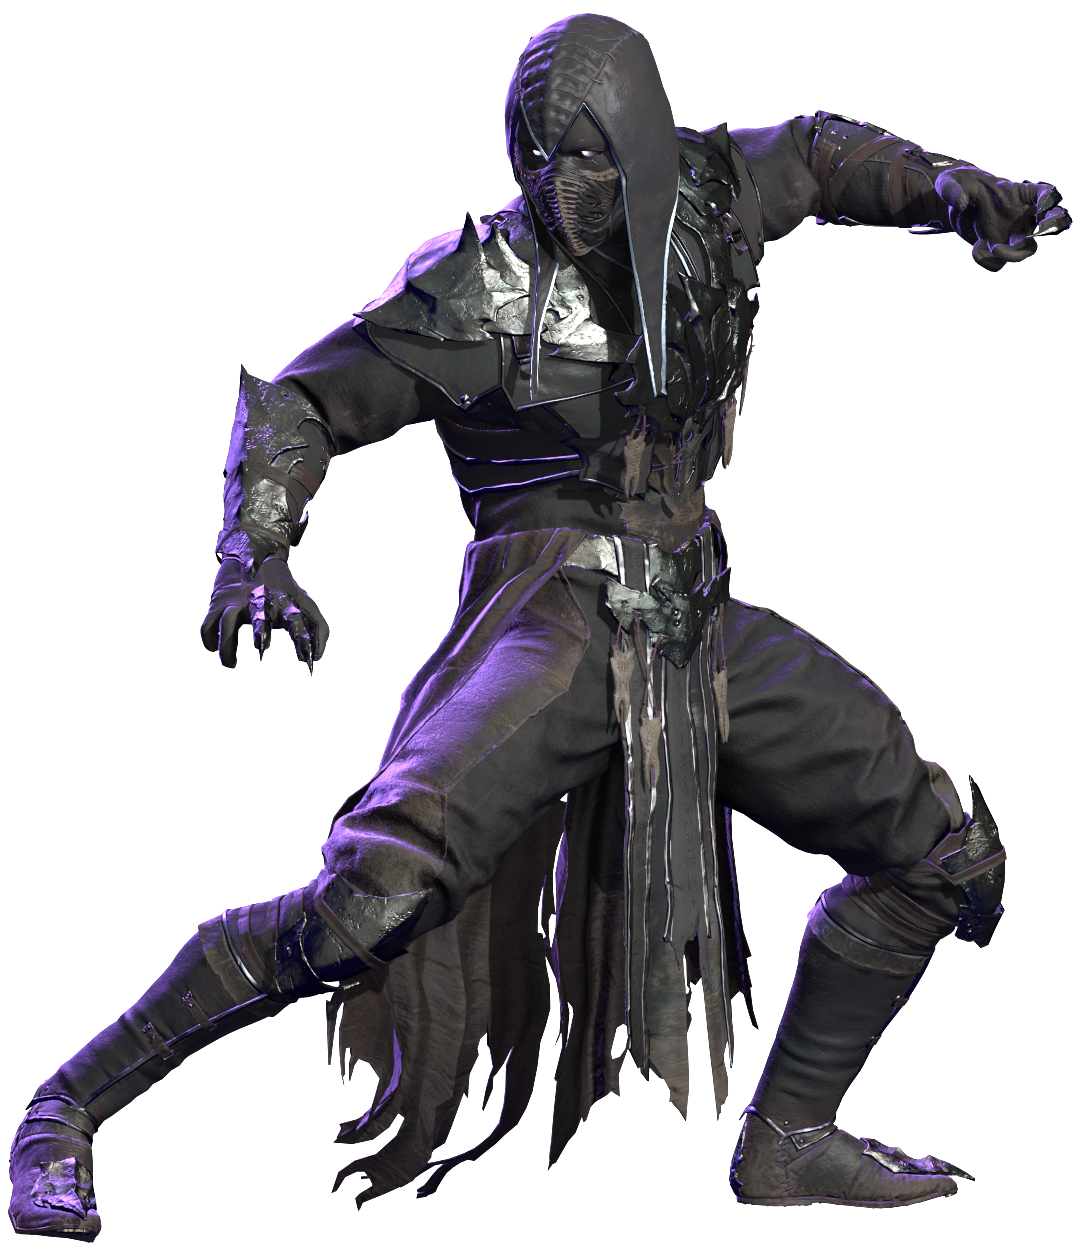 Https Www Deviantart Com Yare Yare Dong Art Noob Saibot 795802953 Noob Saibot Mortal Kombat Characters Mortal Kombat Art